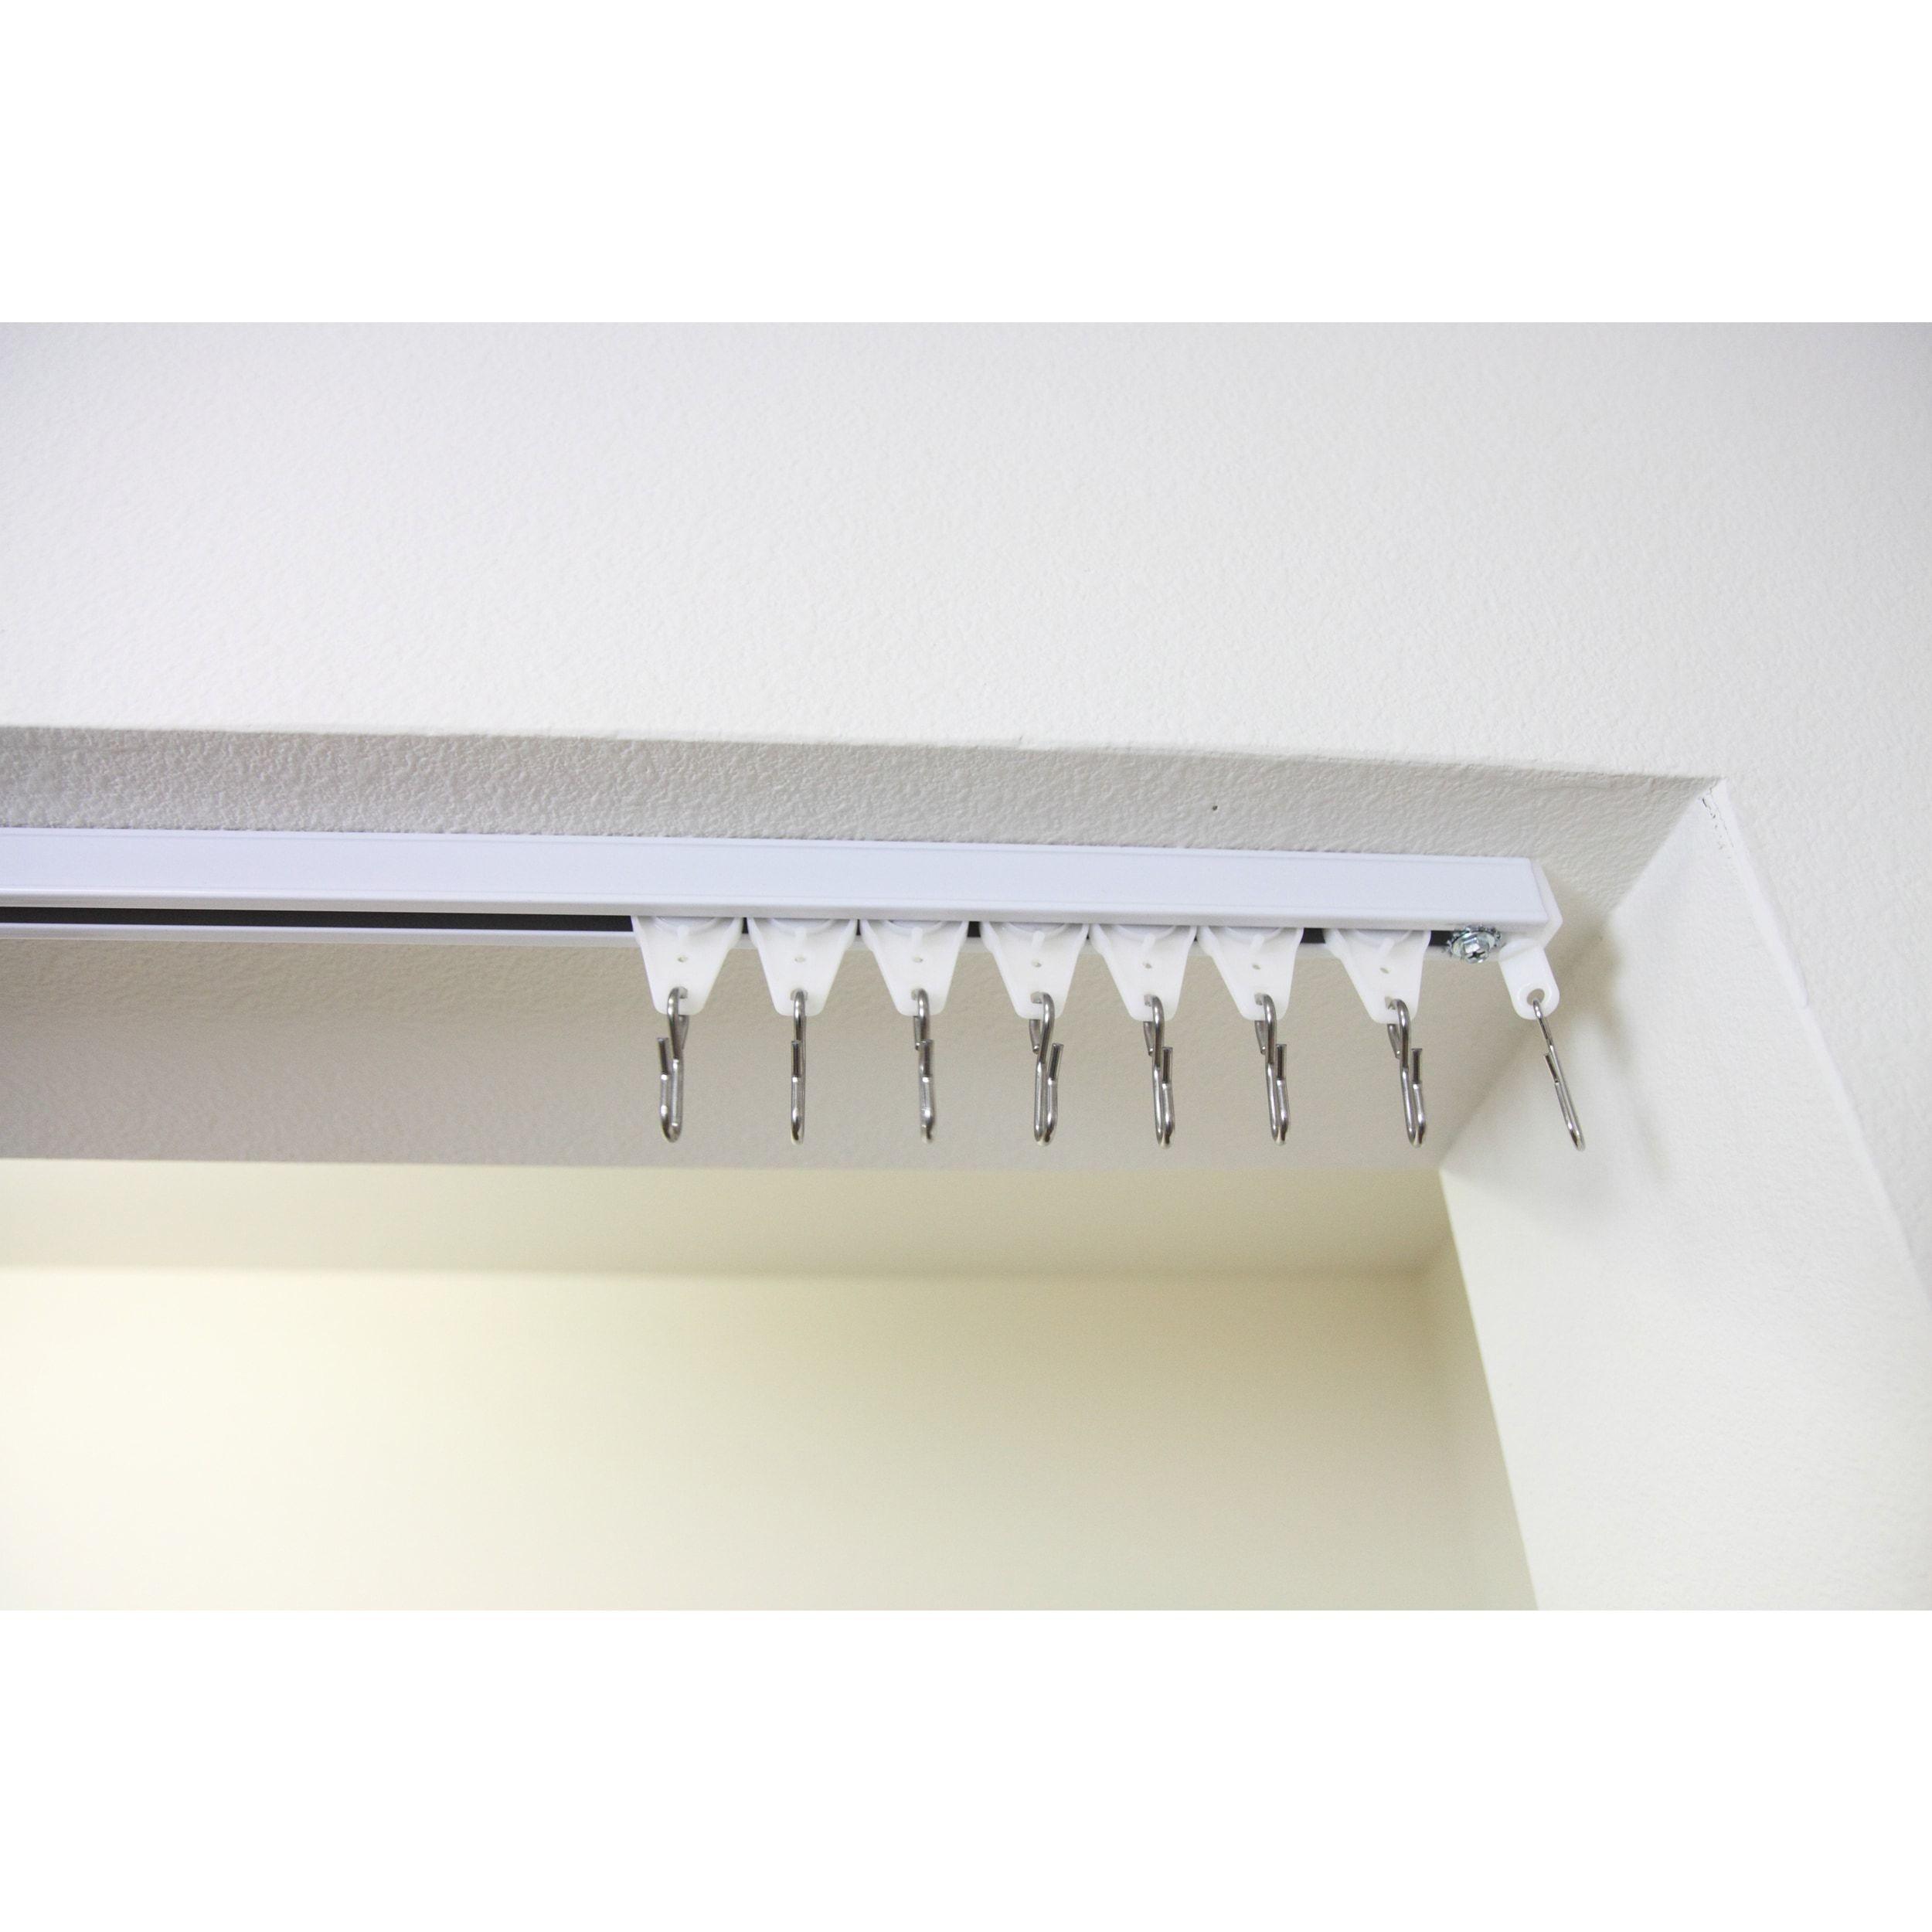 Instyledesign multipurpose room divider track kit up to ft ft